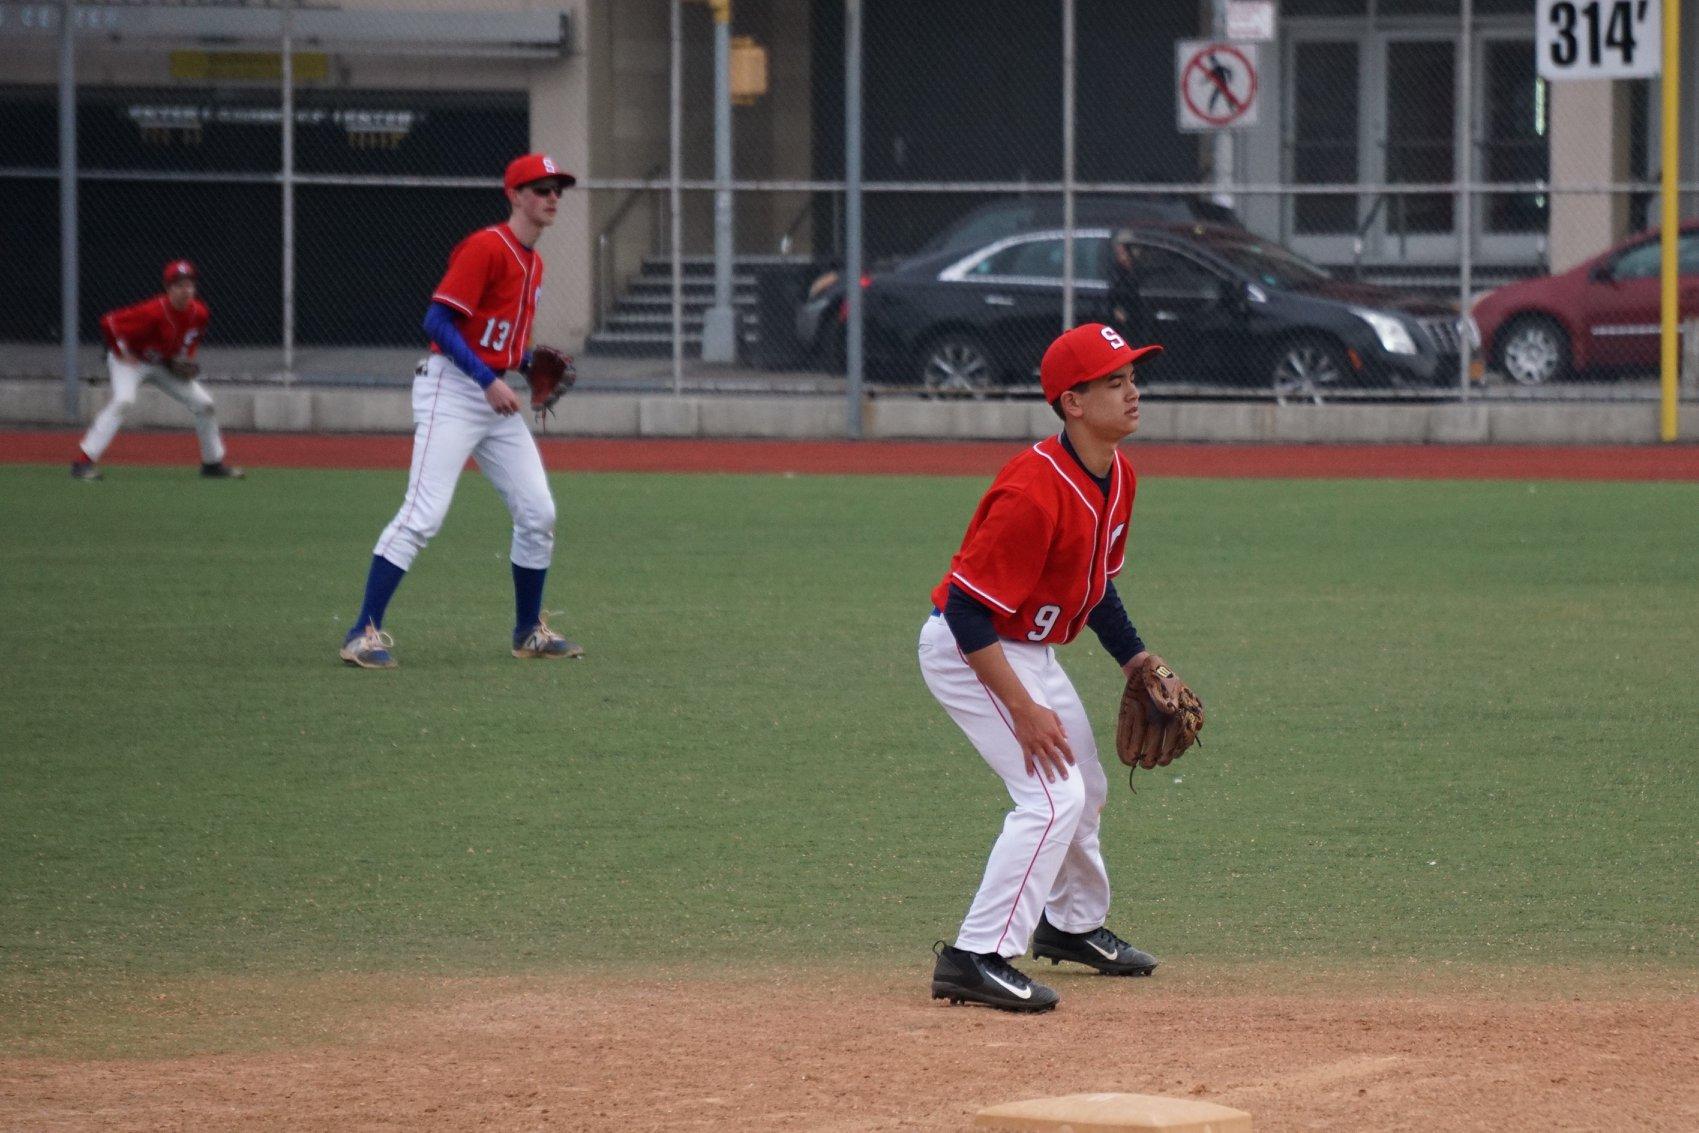 Franklin Liou manning third base